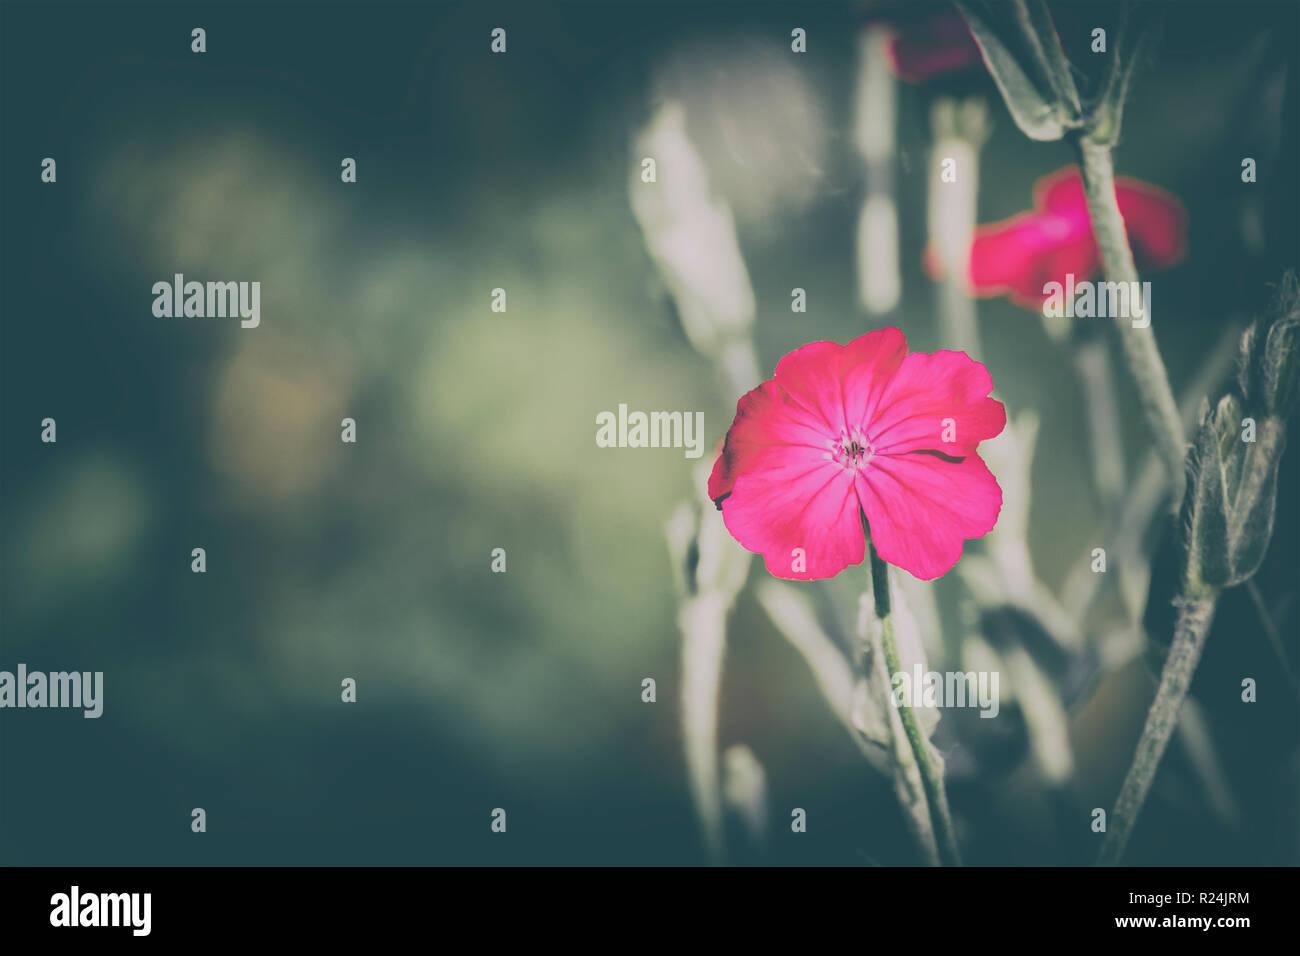 Flower of rose campion (Silene coronaria) - Stock Image